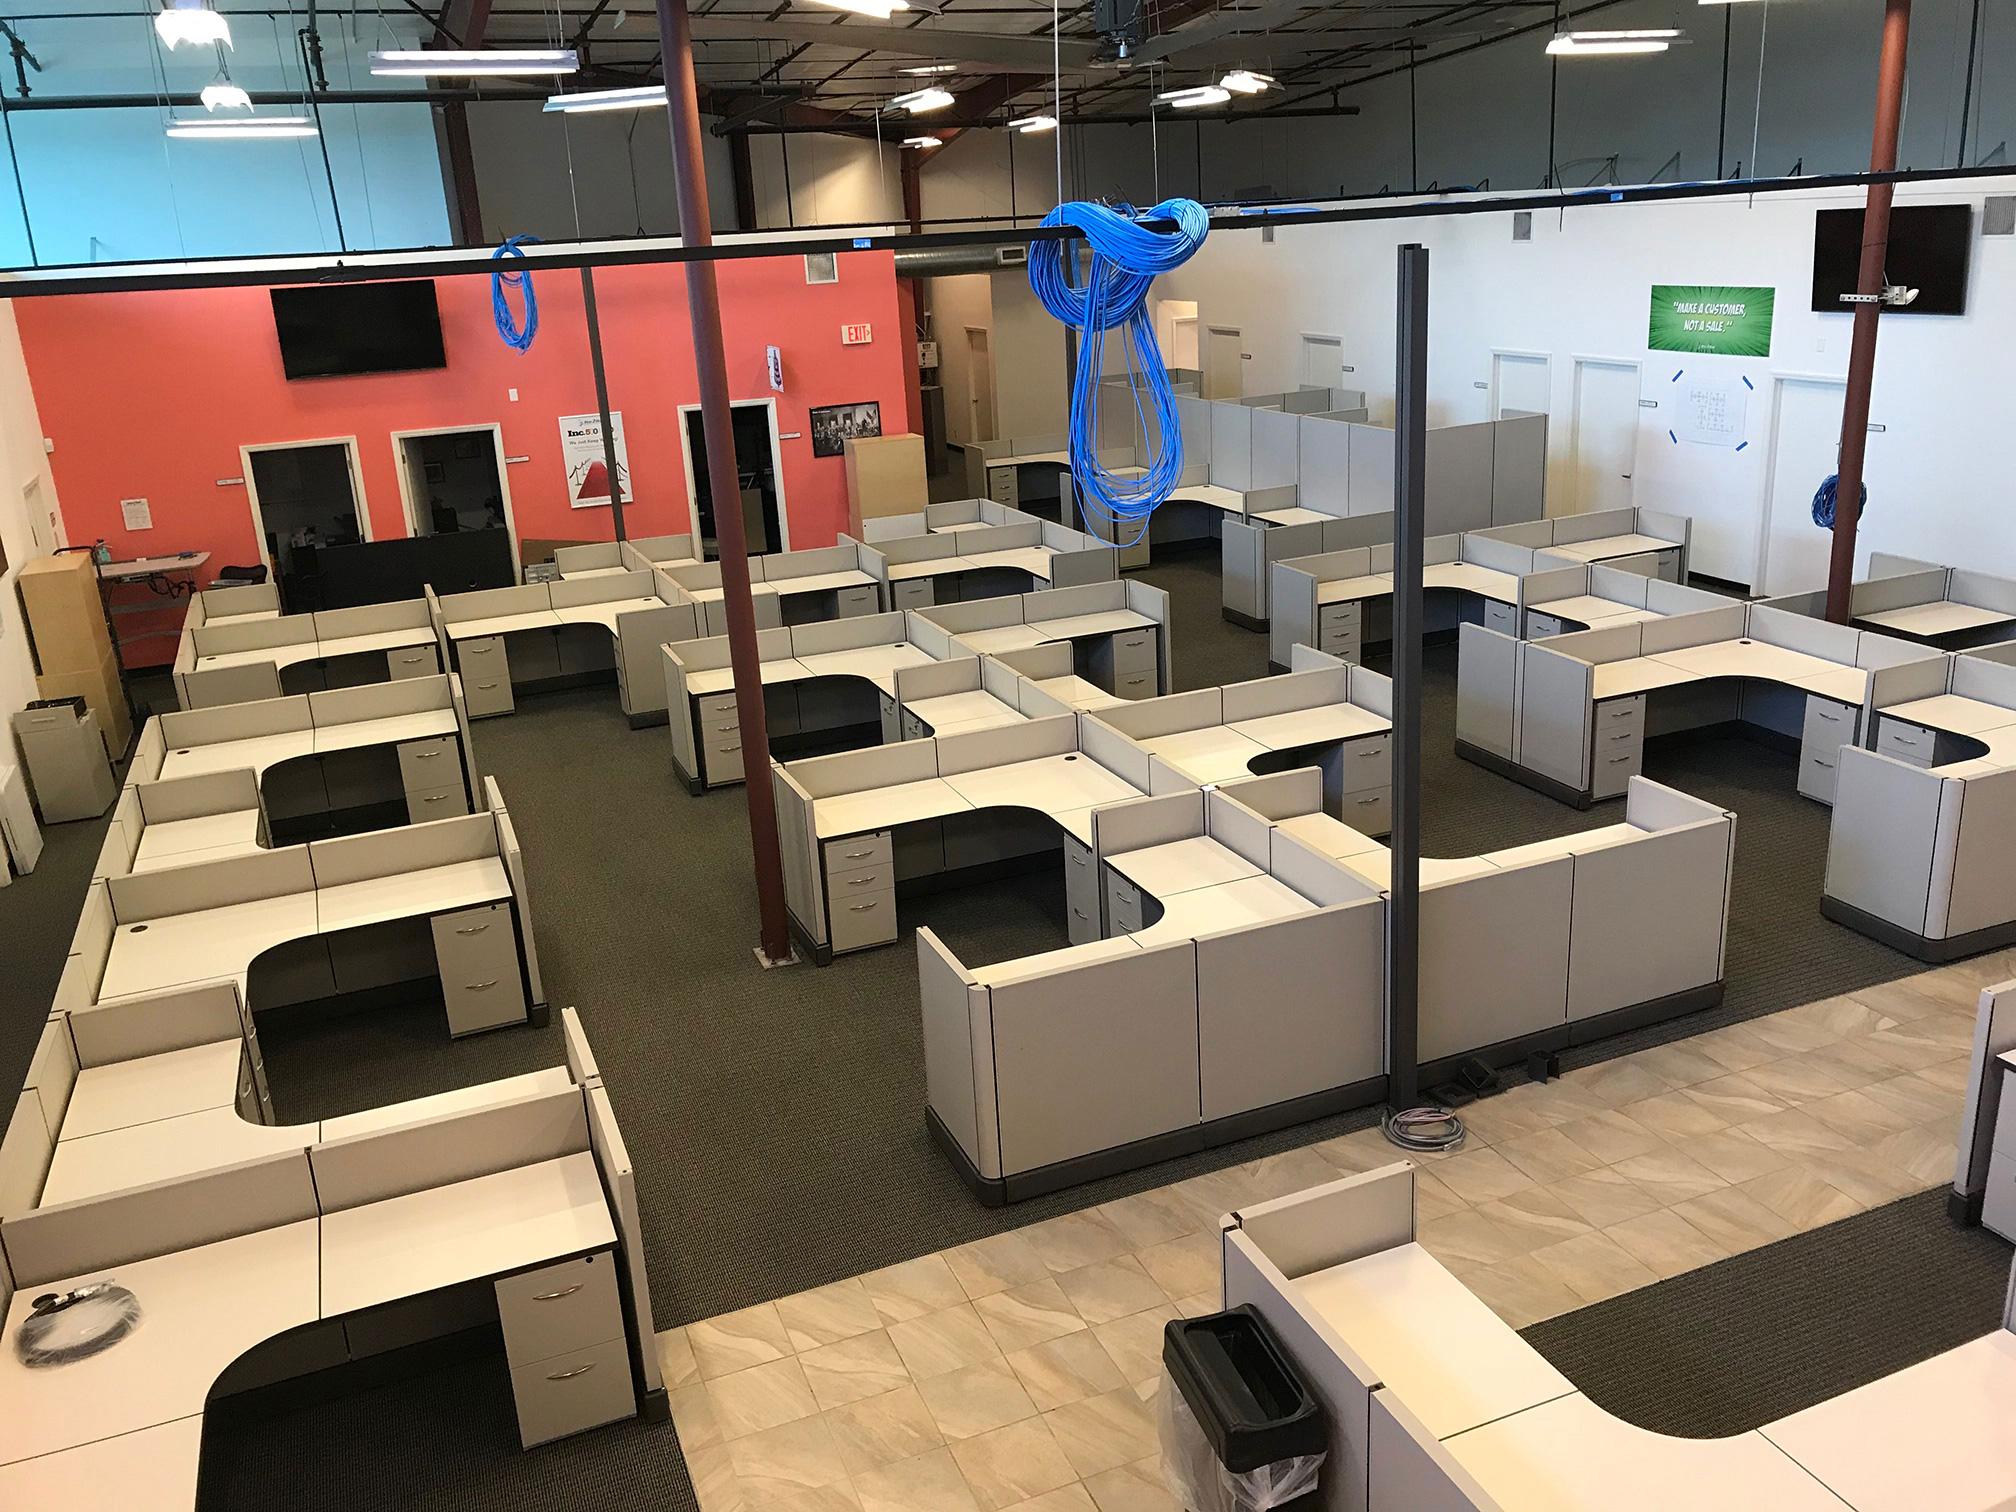 office-cubicles-for-sale-sarasota-manasota-office-supplies-llc.jpg